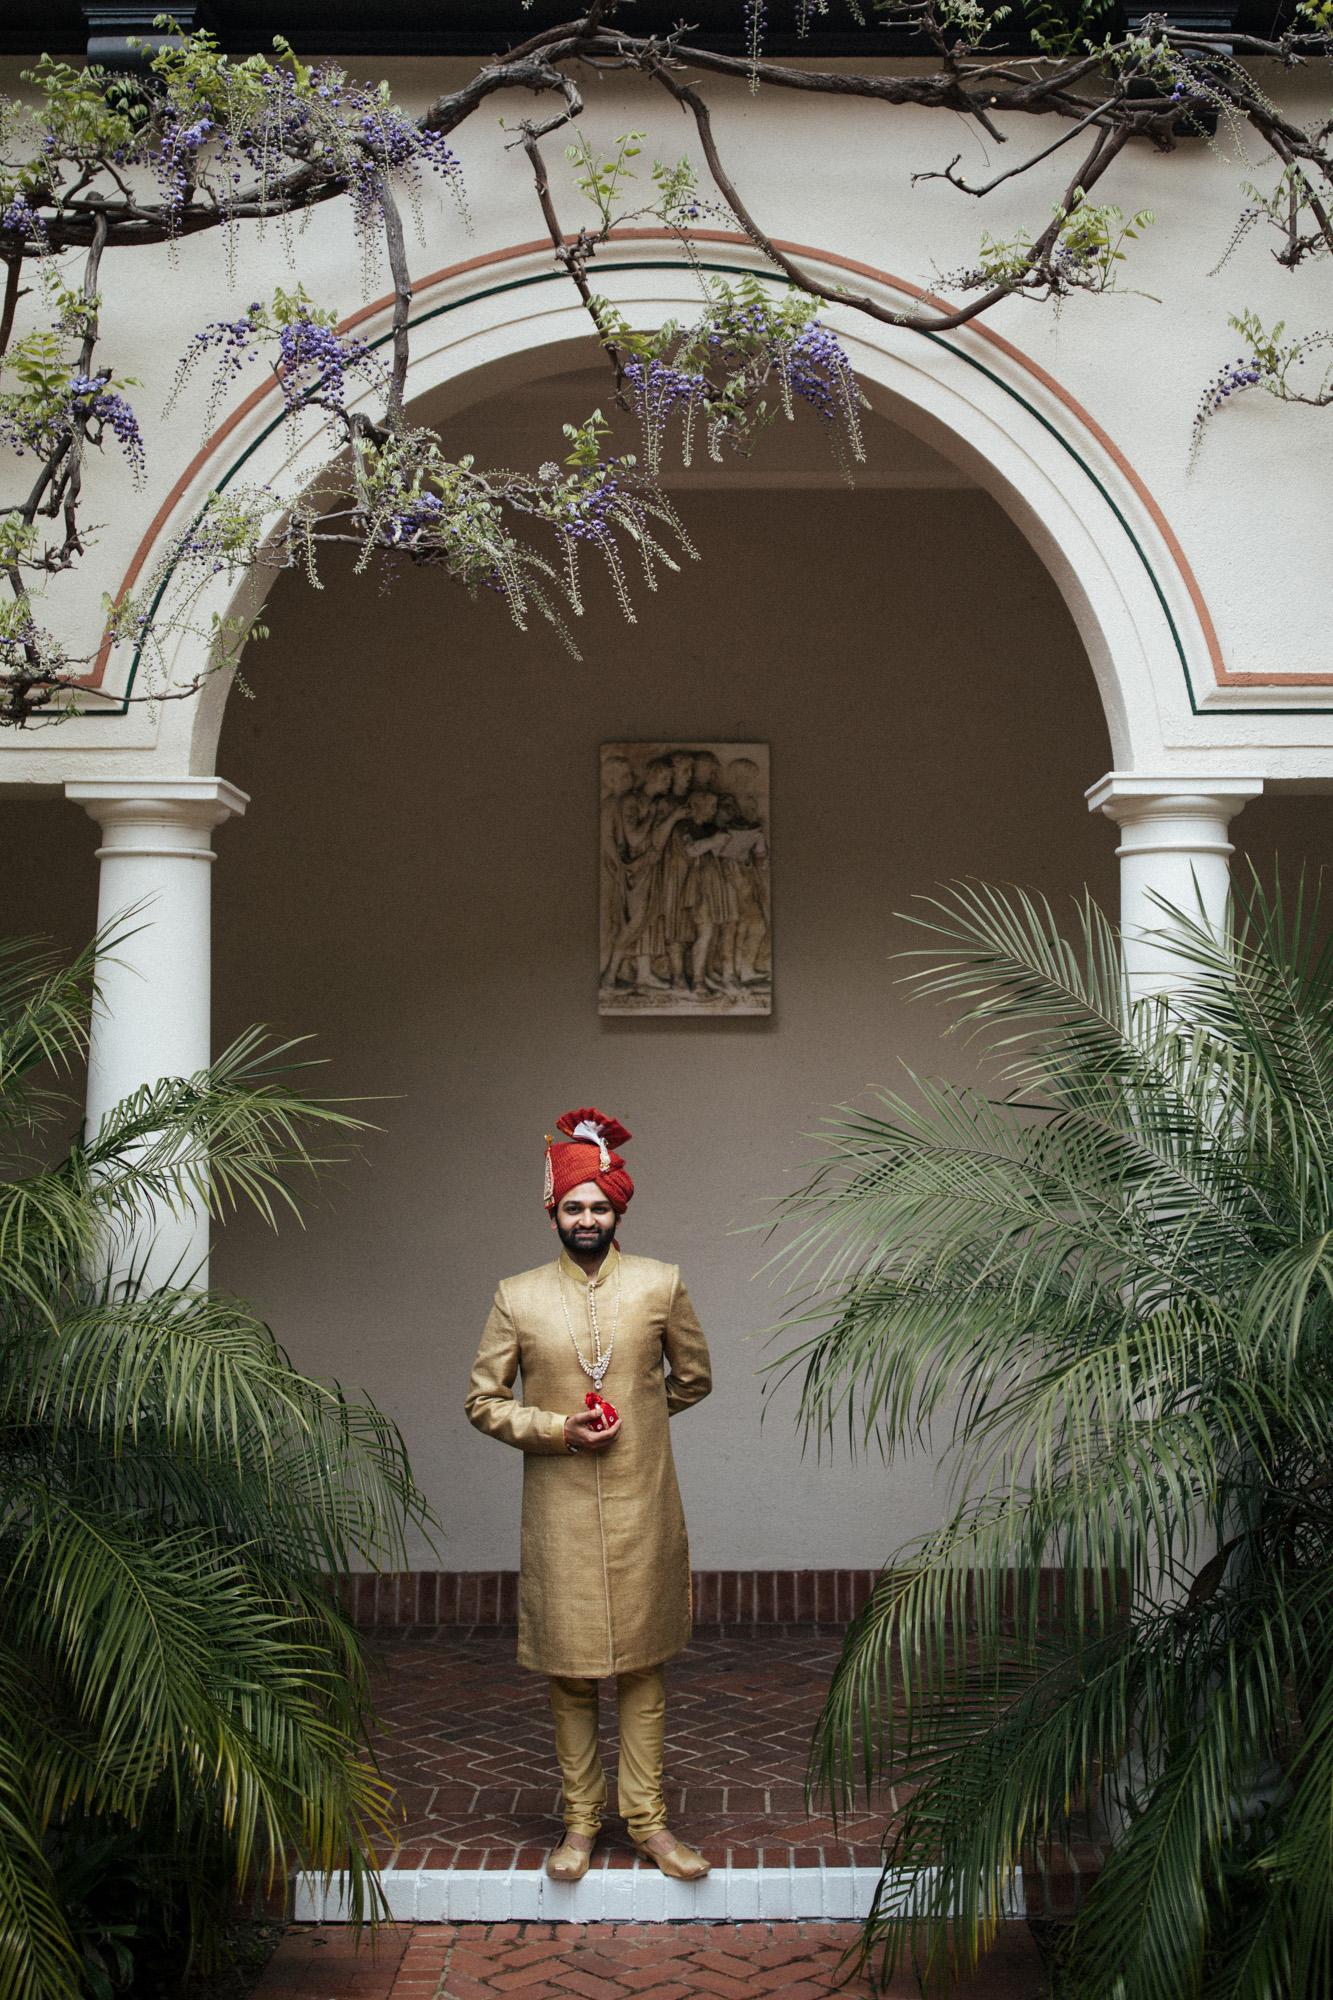 anu_maneesh_alec_vanderboom_Indian_wedding_photography-0065.jpg